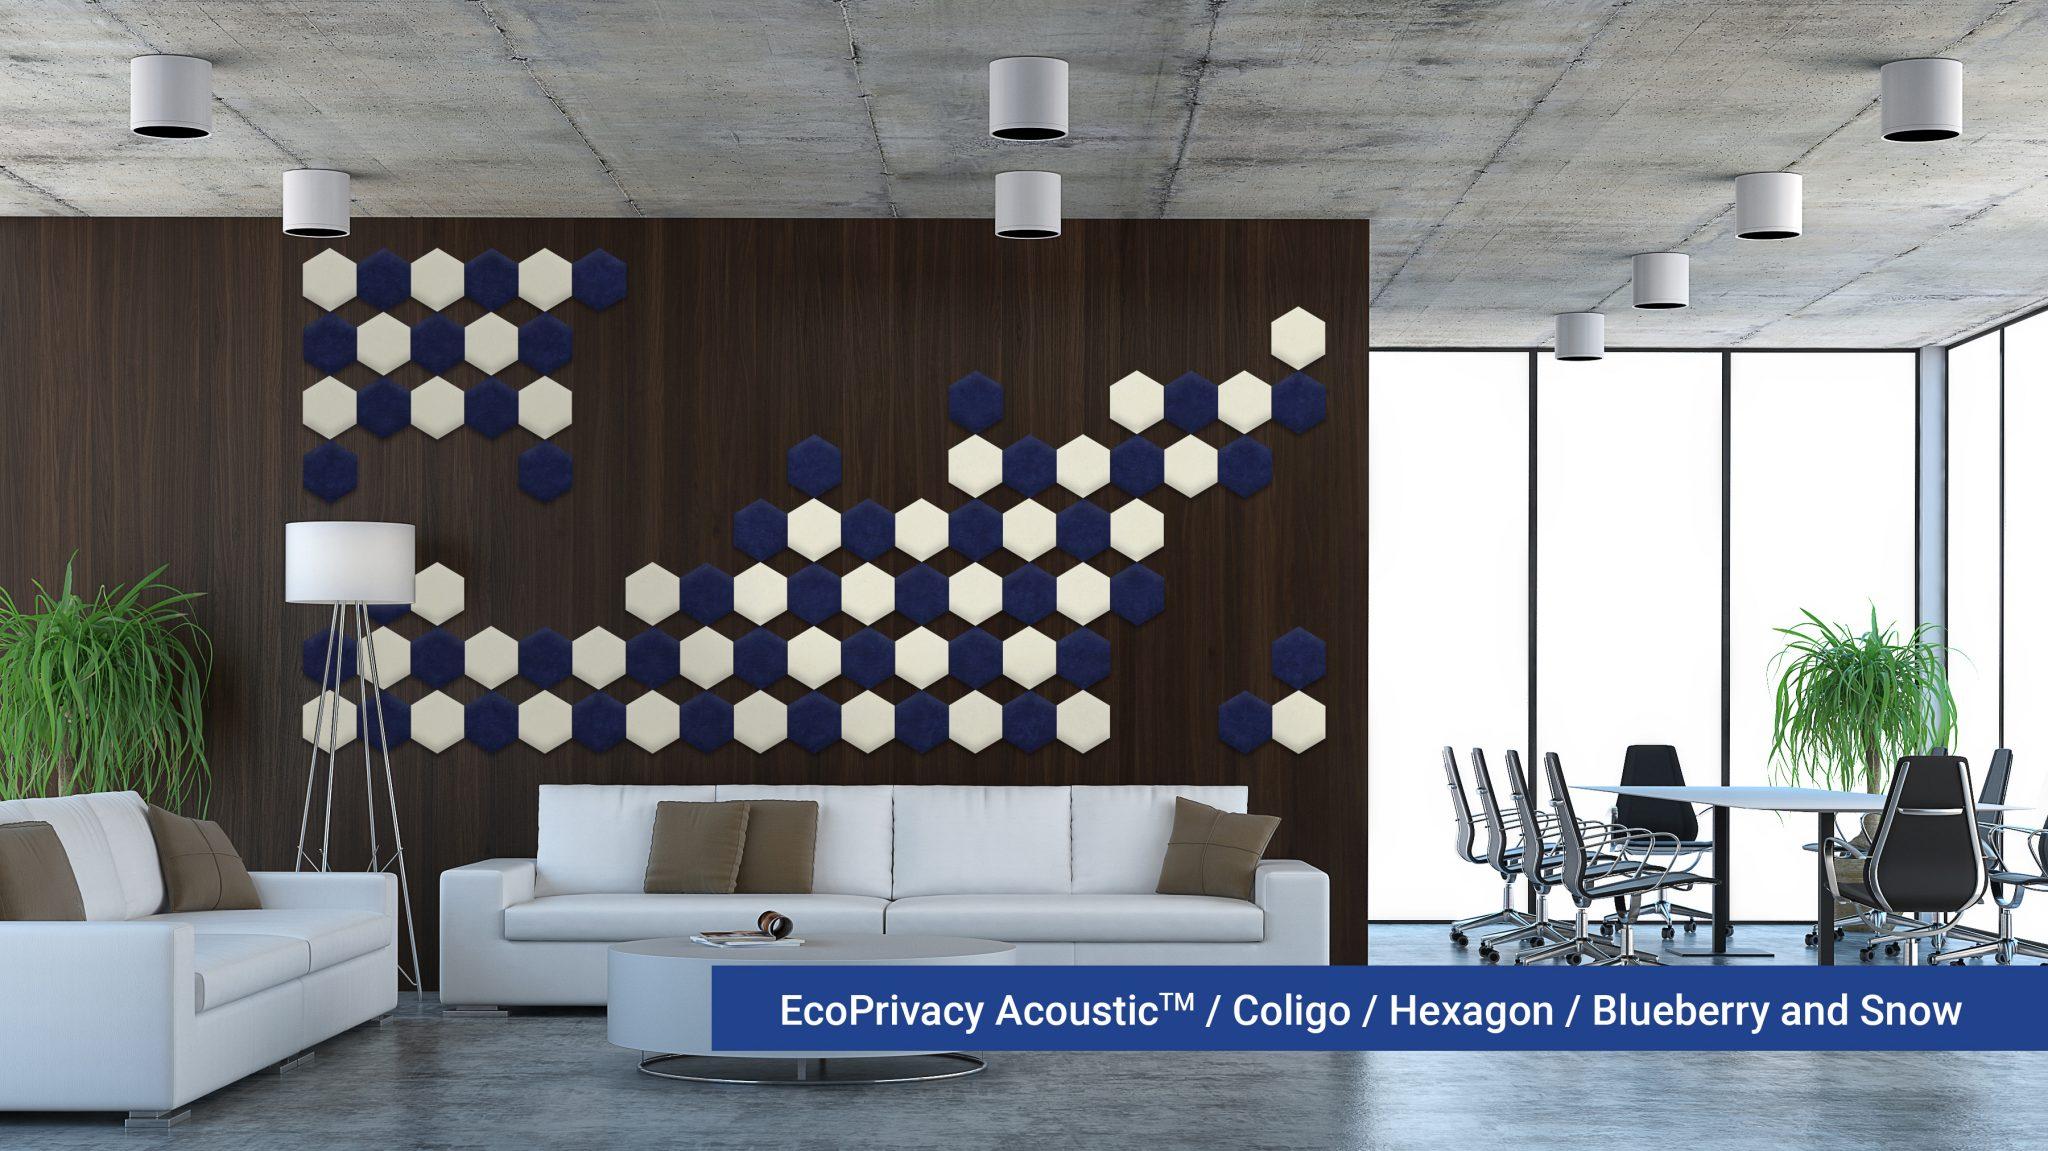 Coligo-Hexagon-Blueberry-01-Snow-20180925.jpg